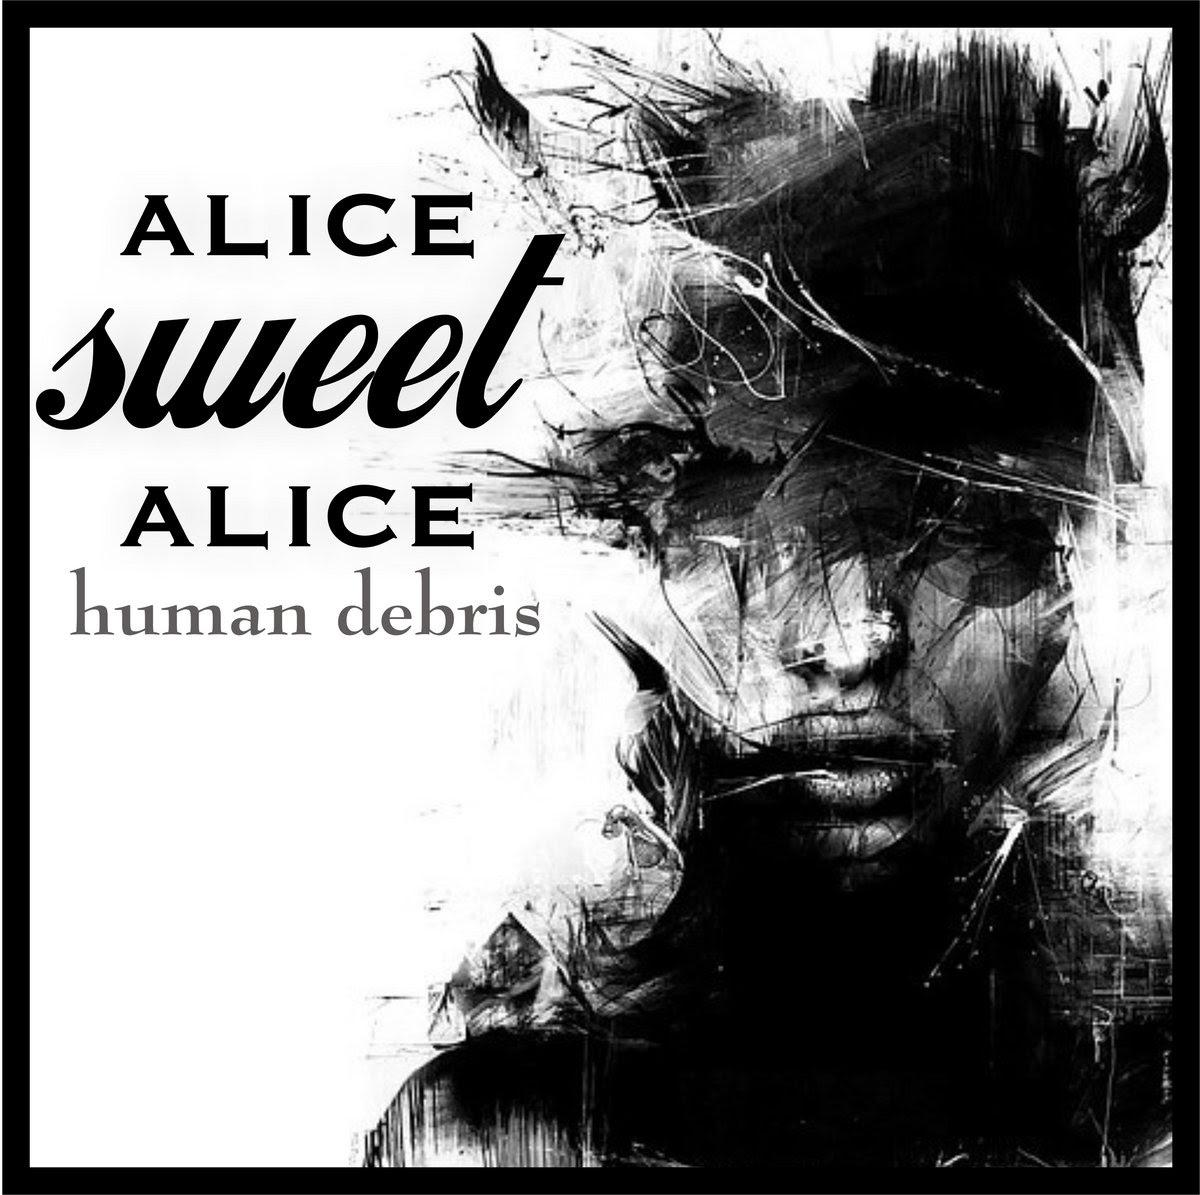 www.facebook.com/alicesweetalice